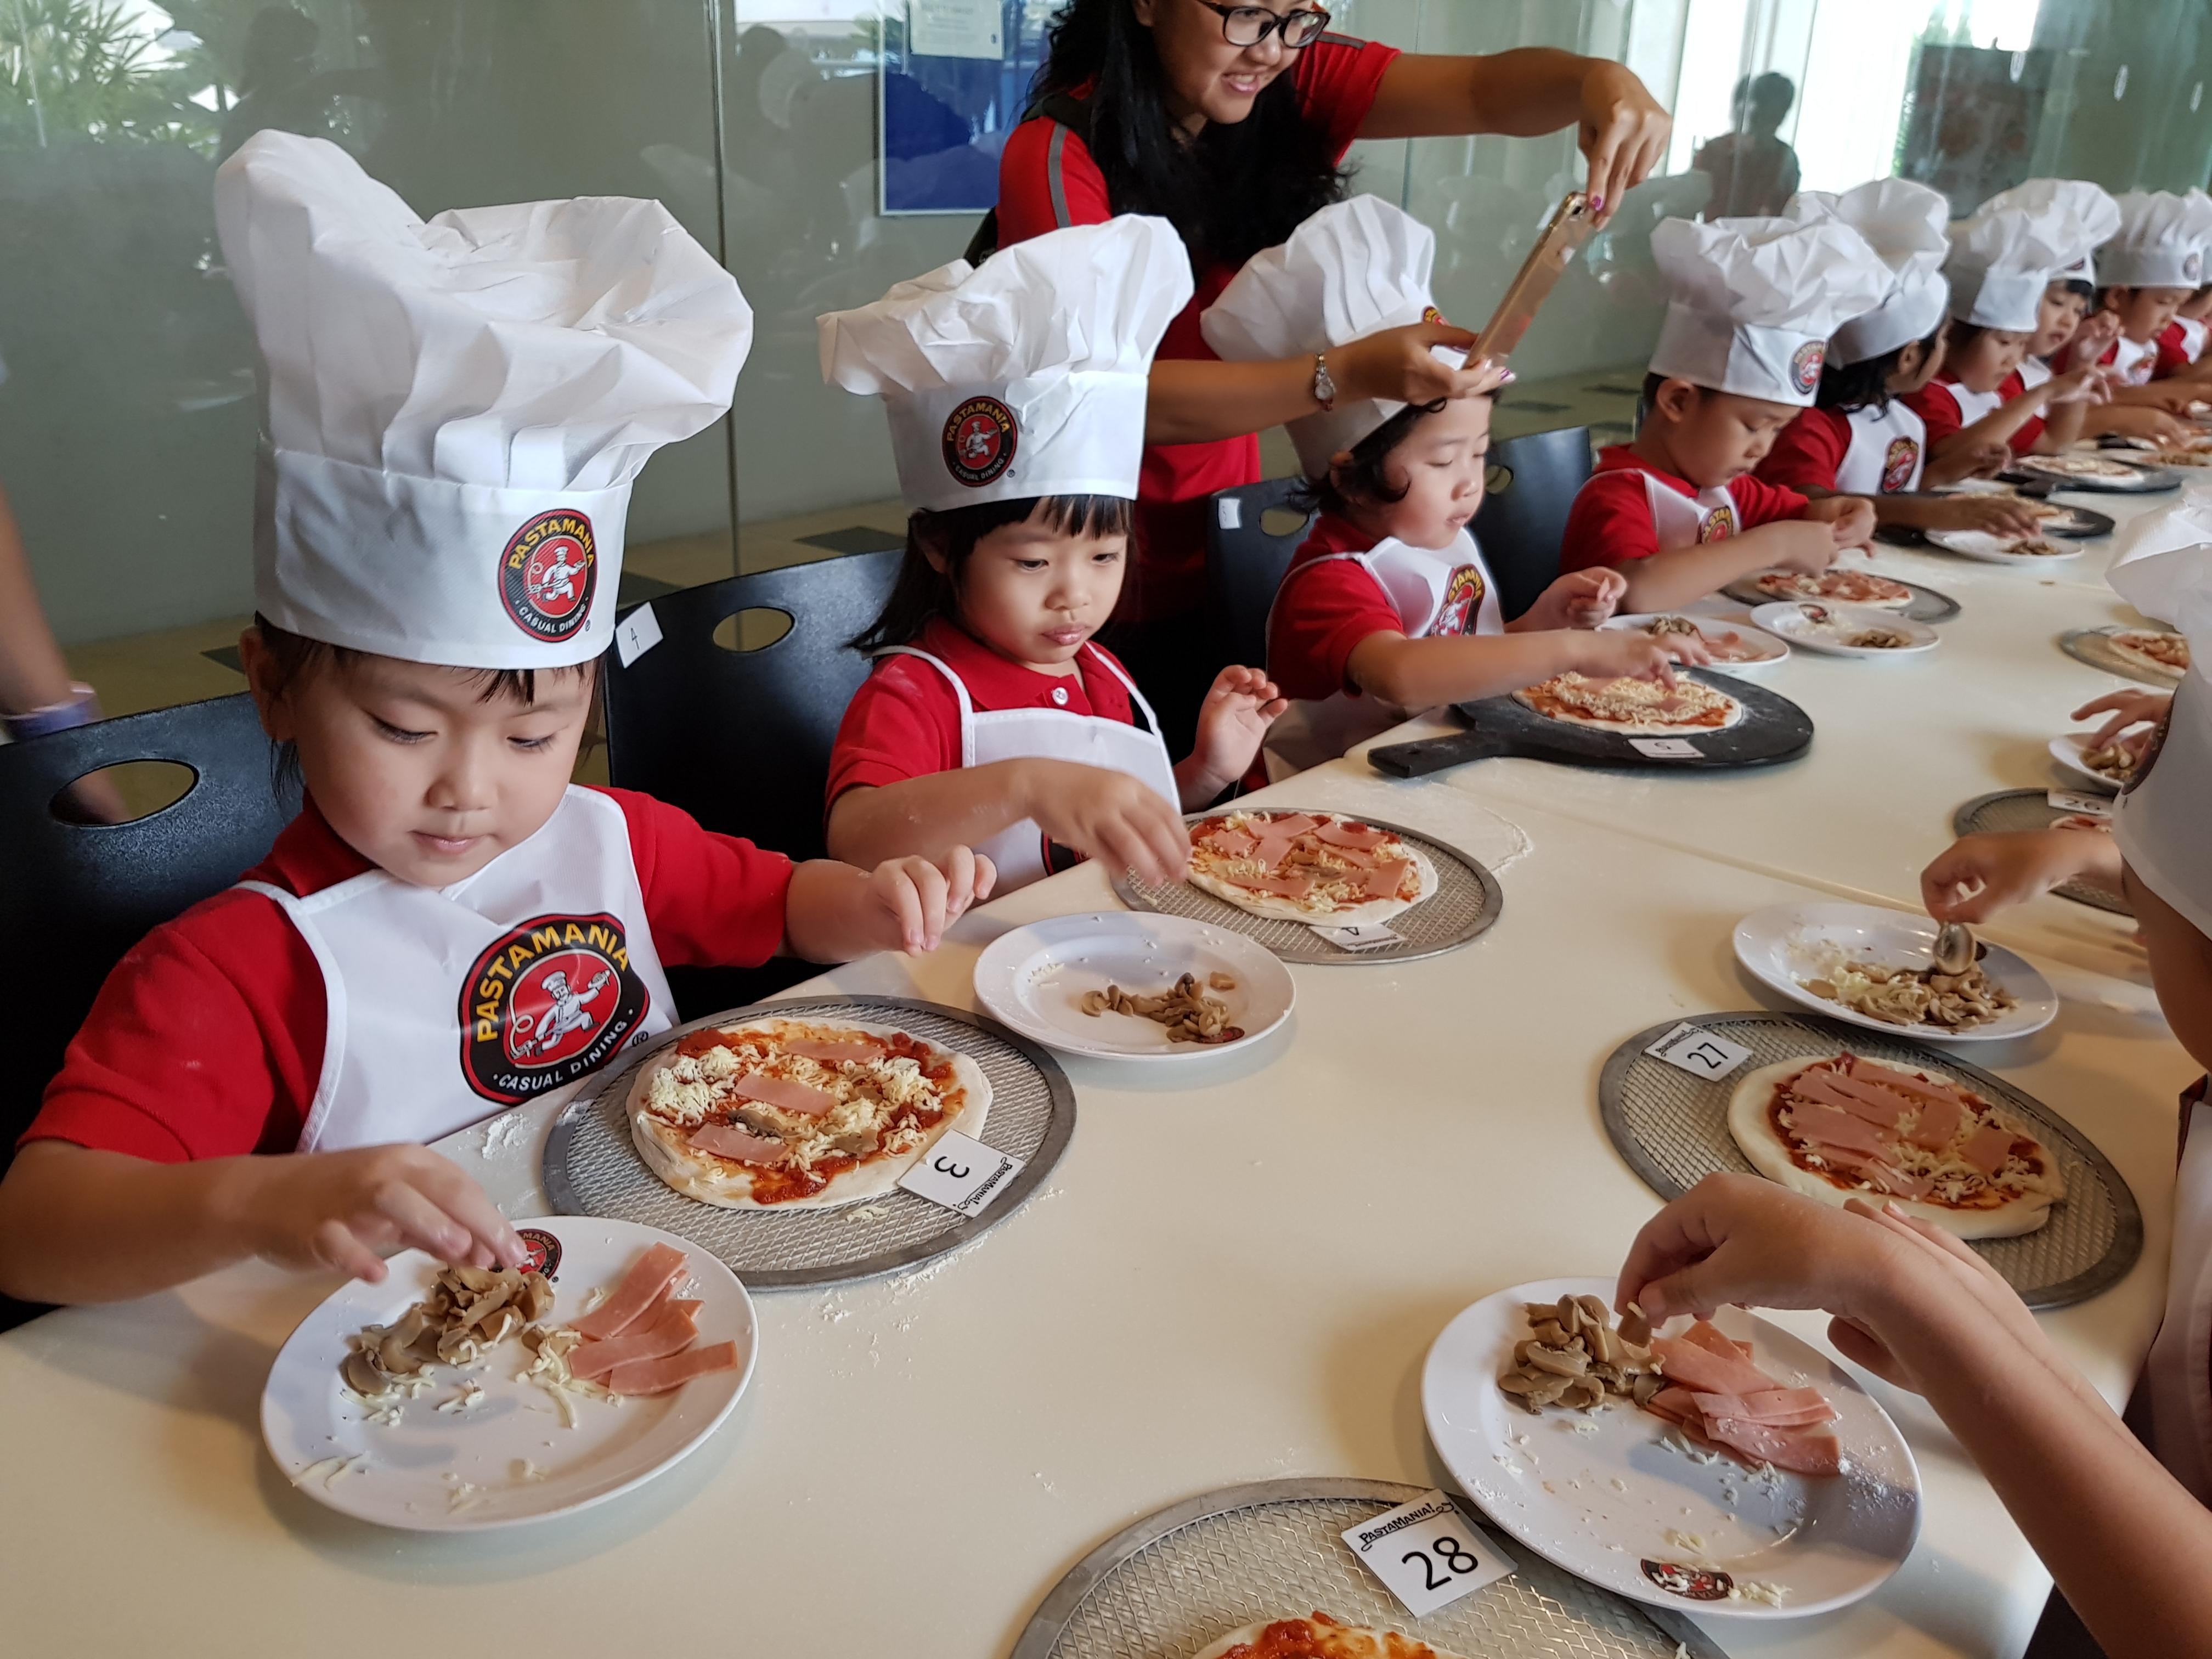 K1 Pizza Making